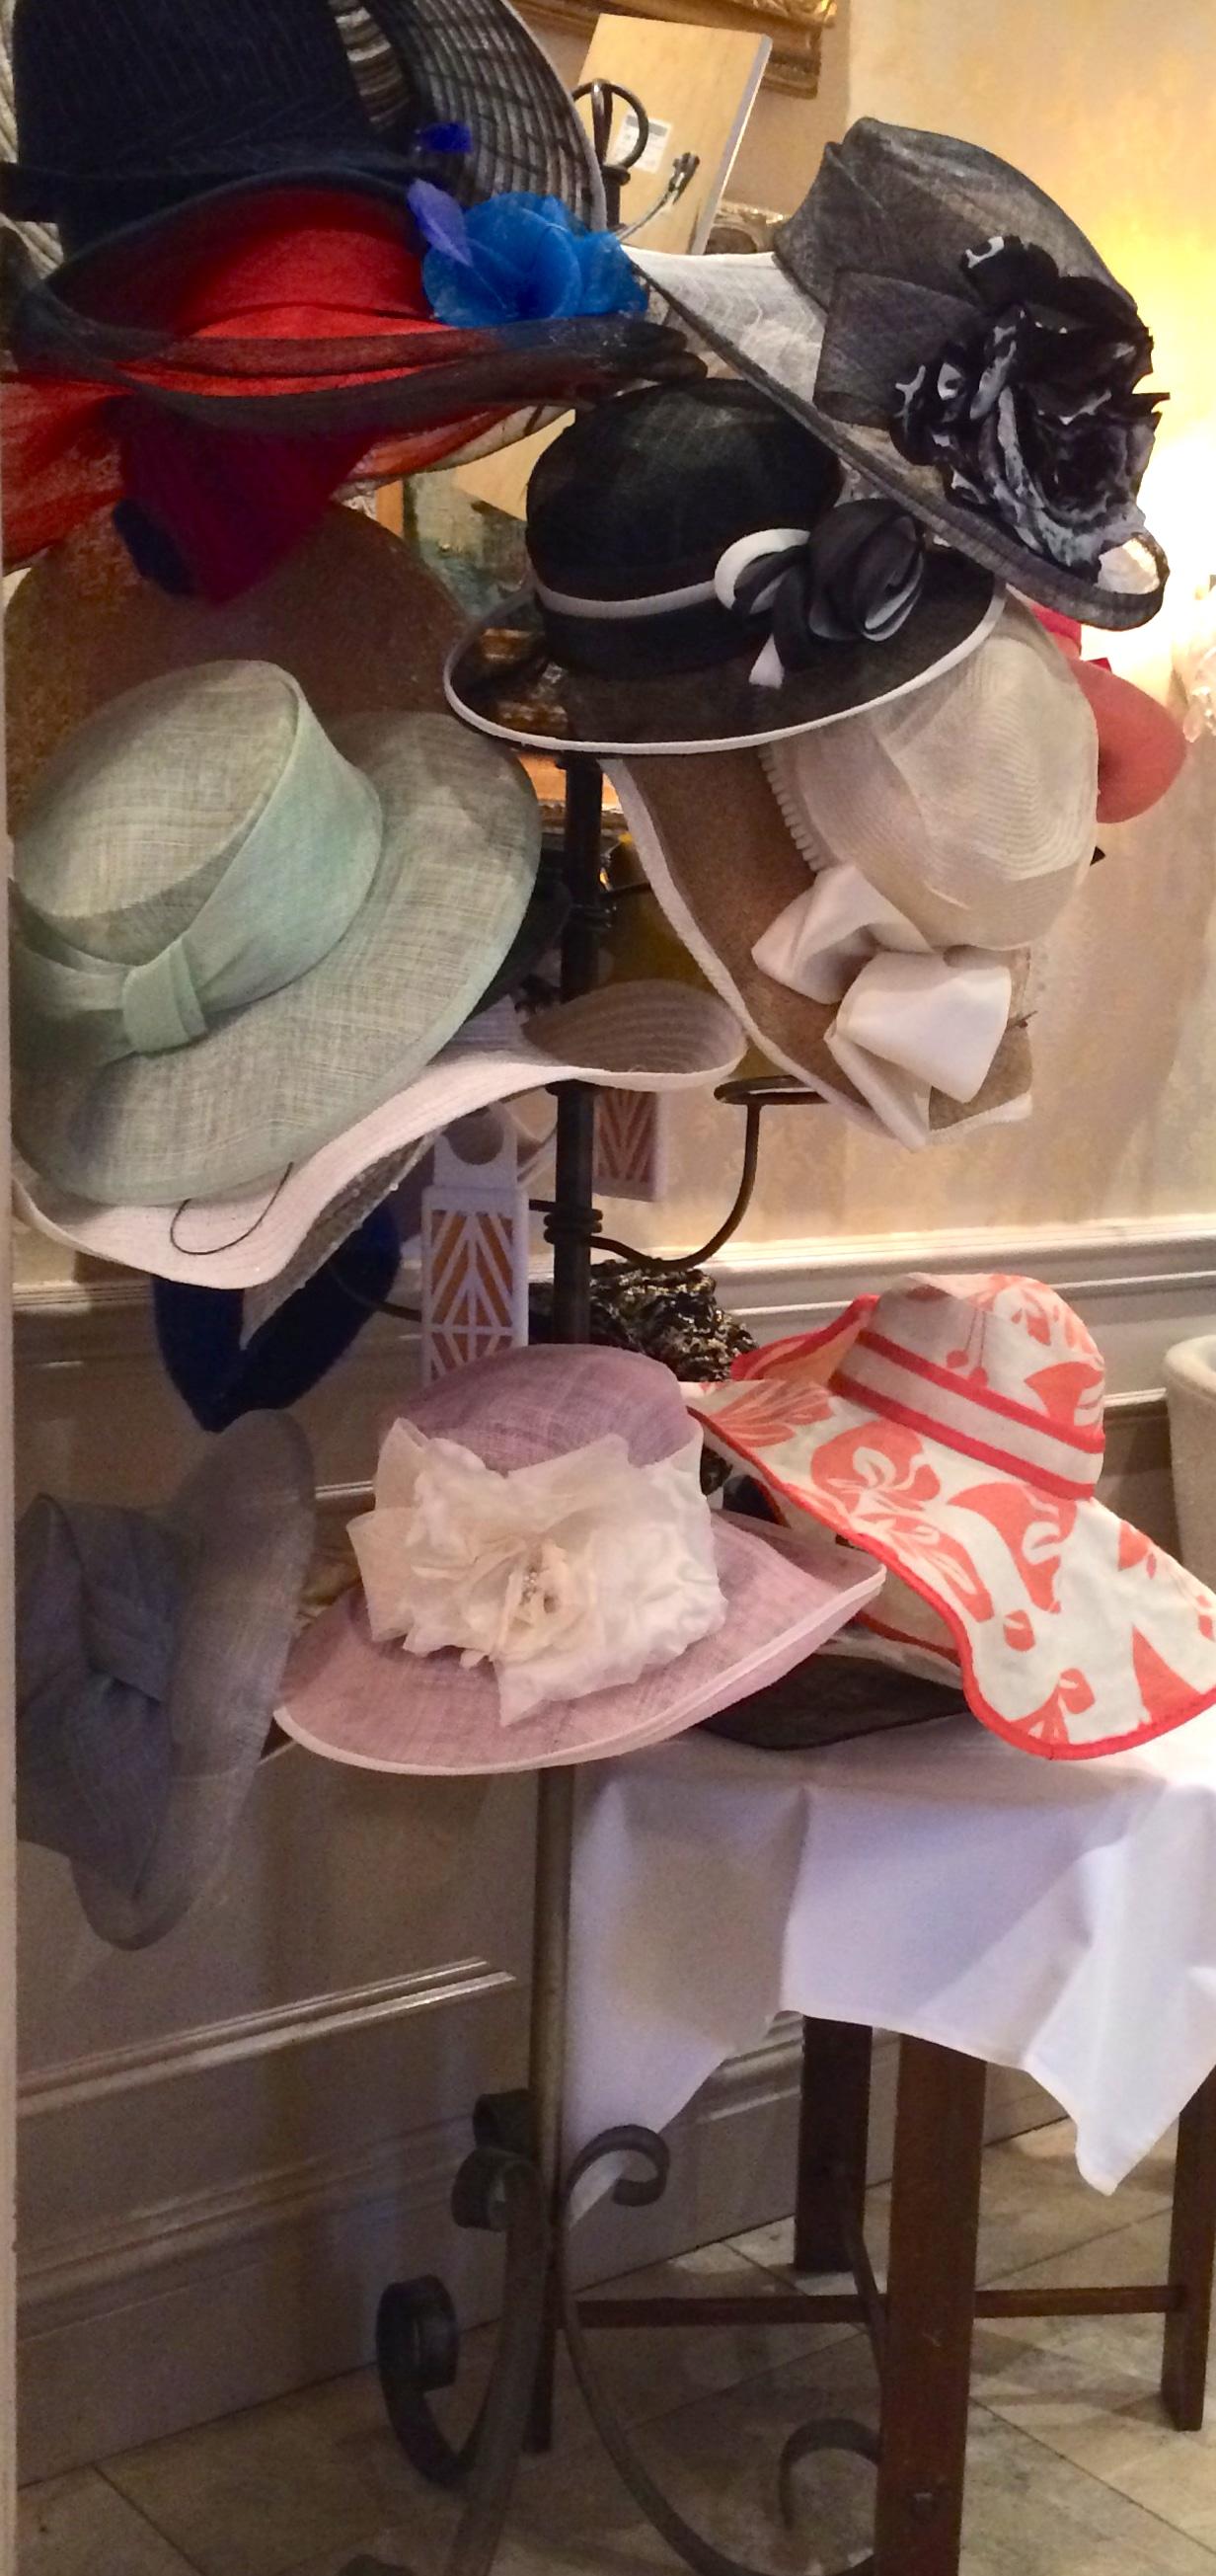 Windsor Arms Tea Hats - Afternoon Tea In Toronto.jpg